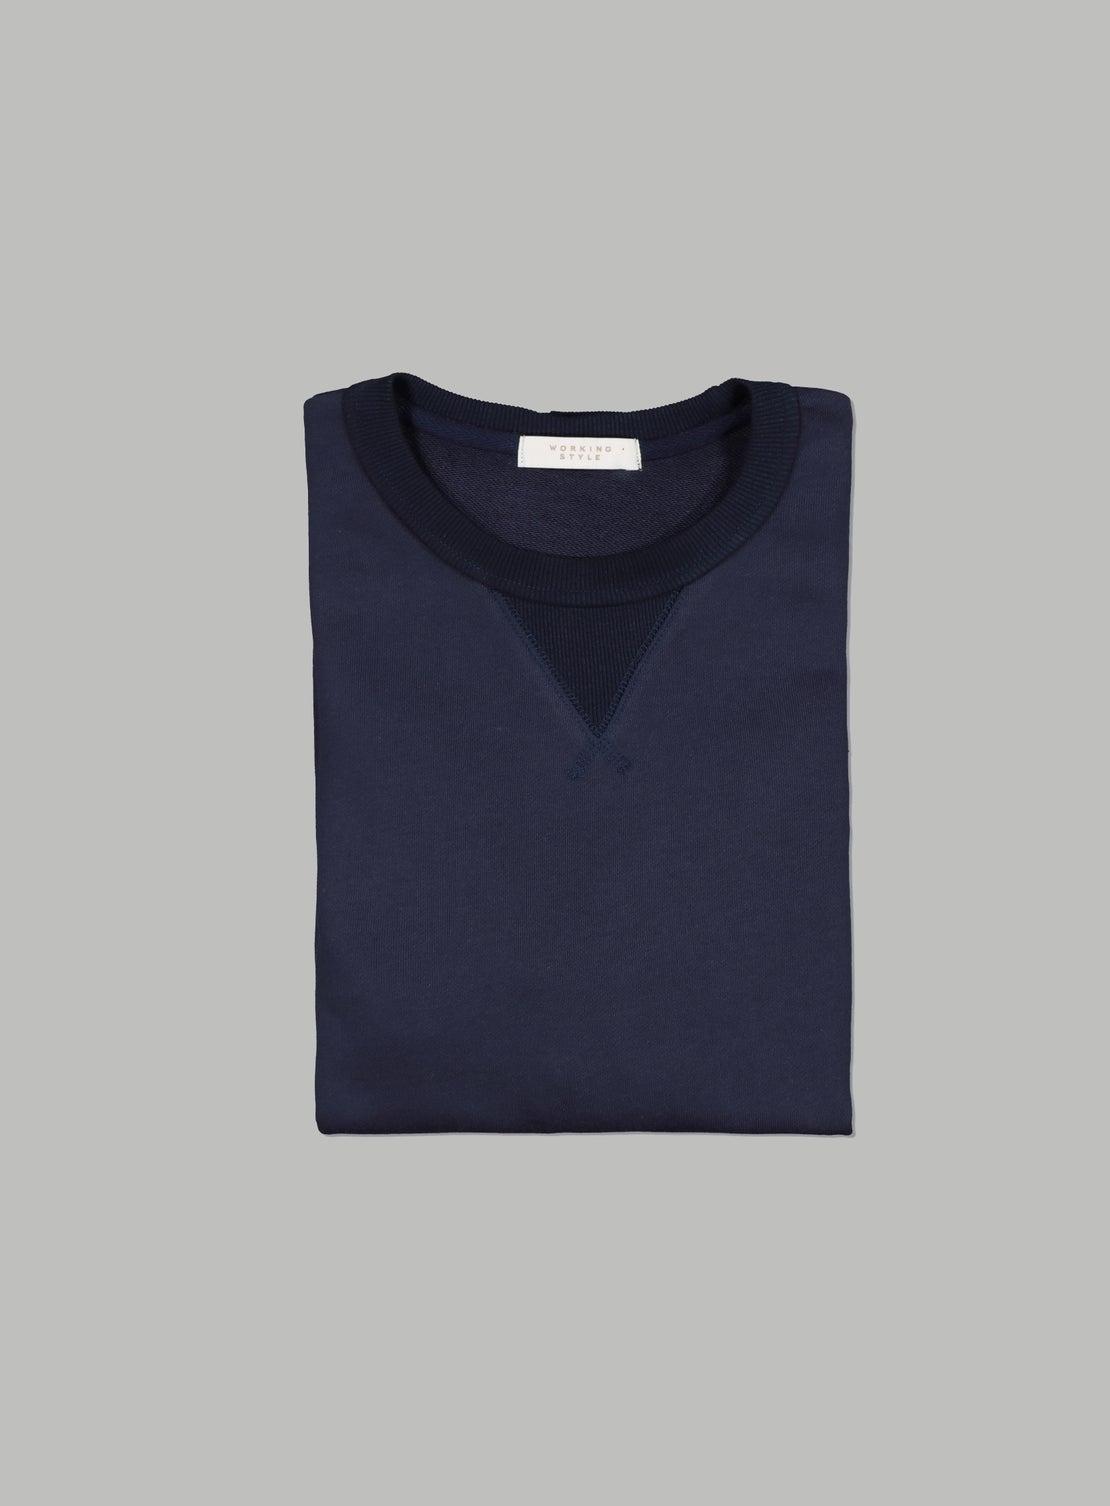 Liston Dark Navy French Terry Sweatshirt